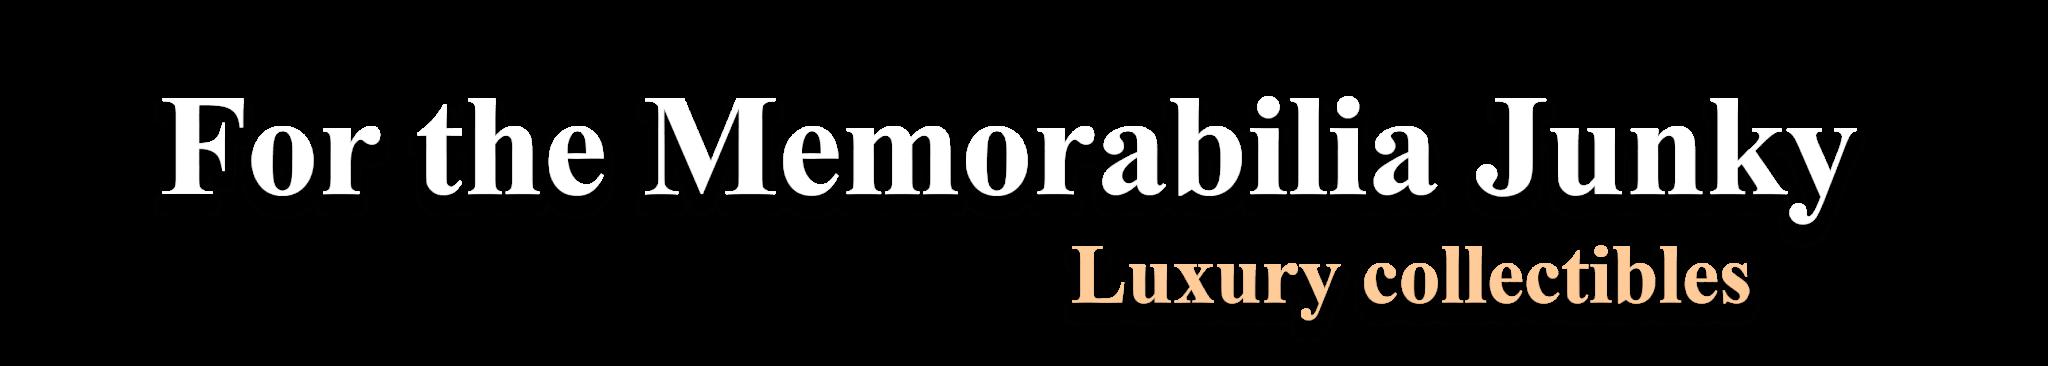 memorabilia-junky